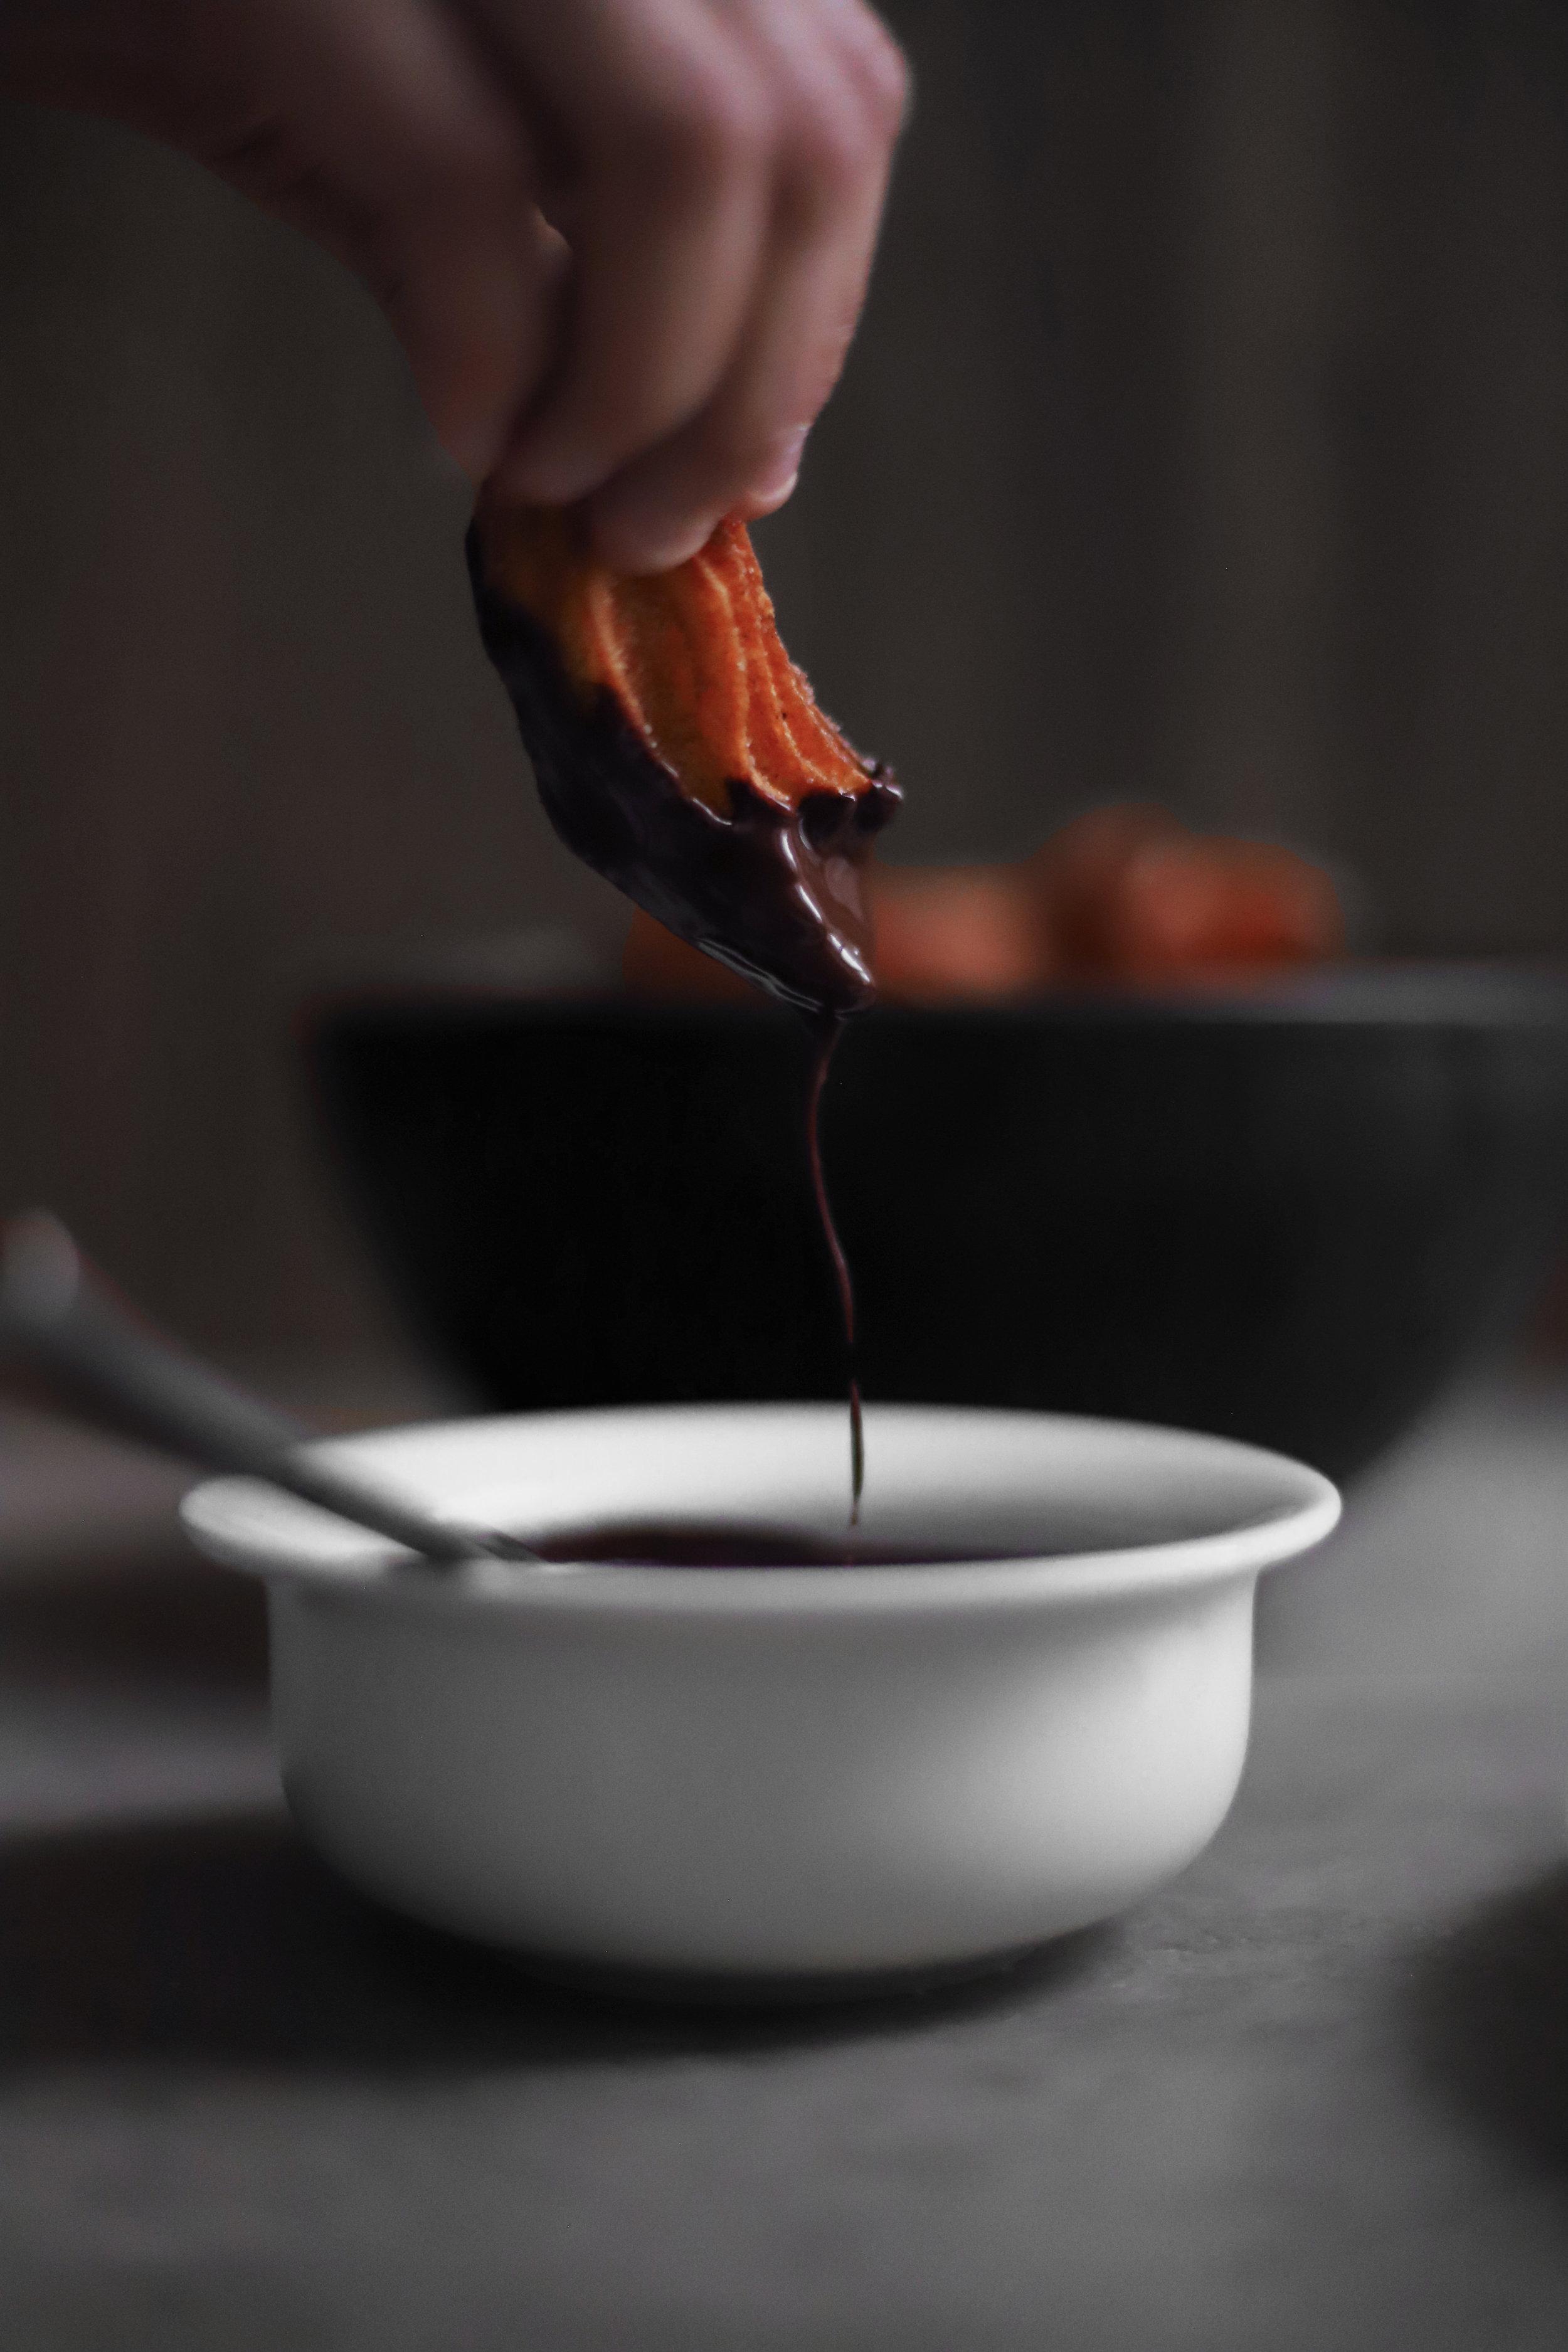 cardamom churros with orange blossom chocolate sauce